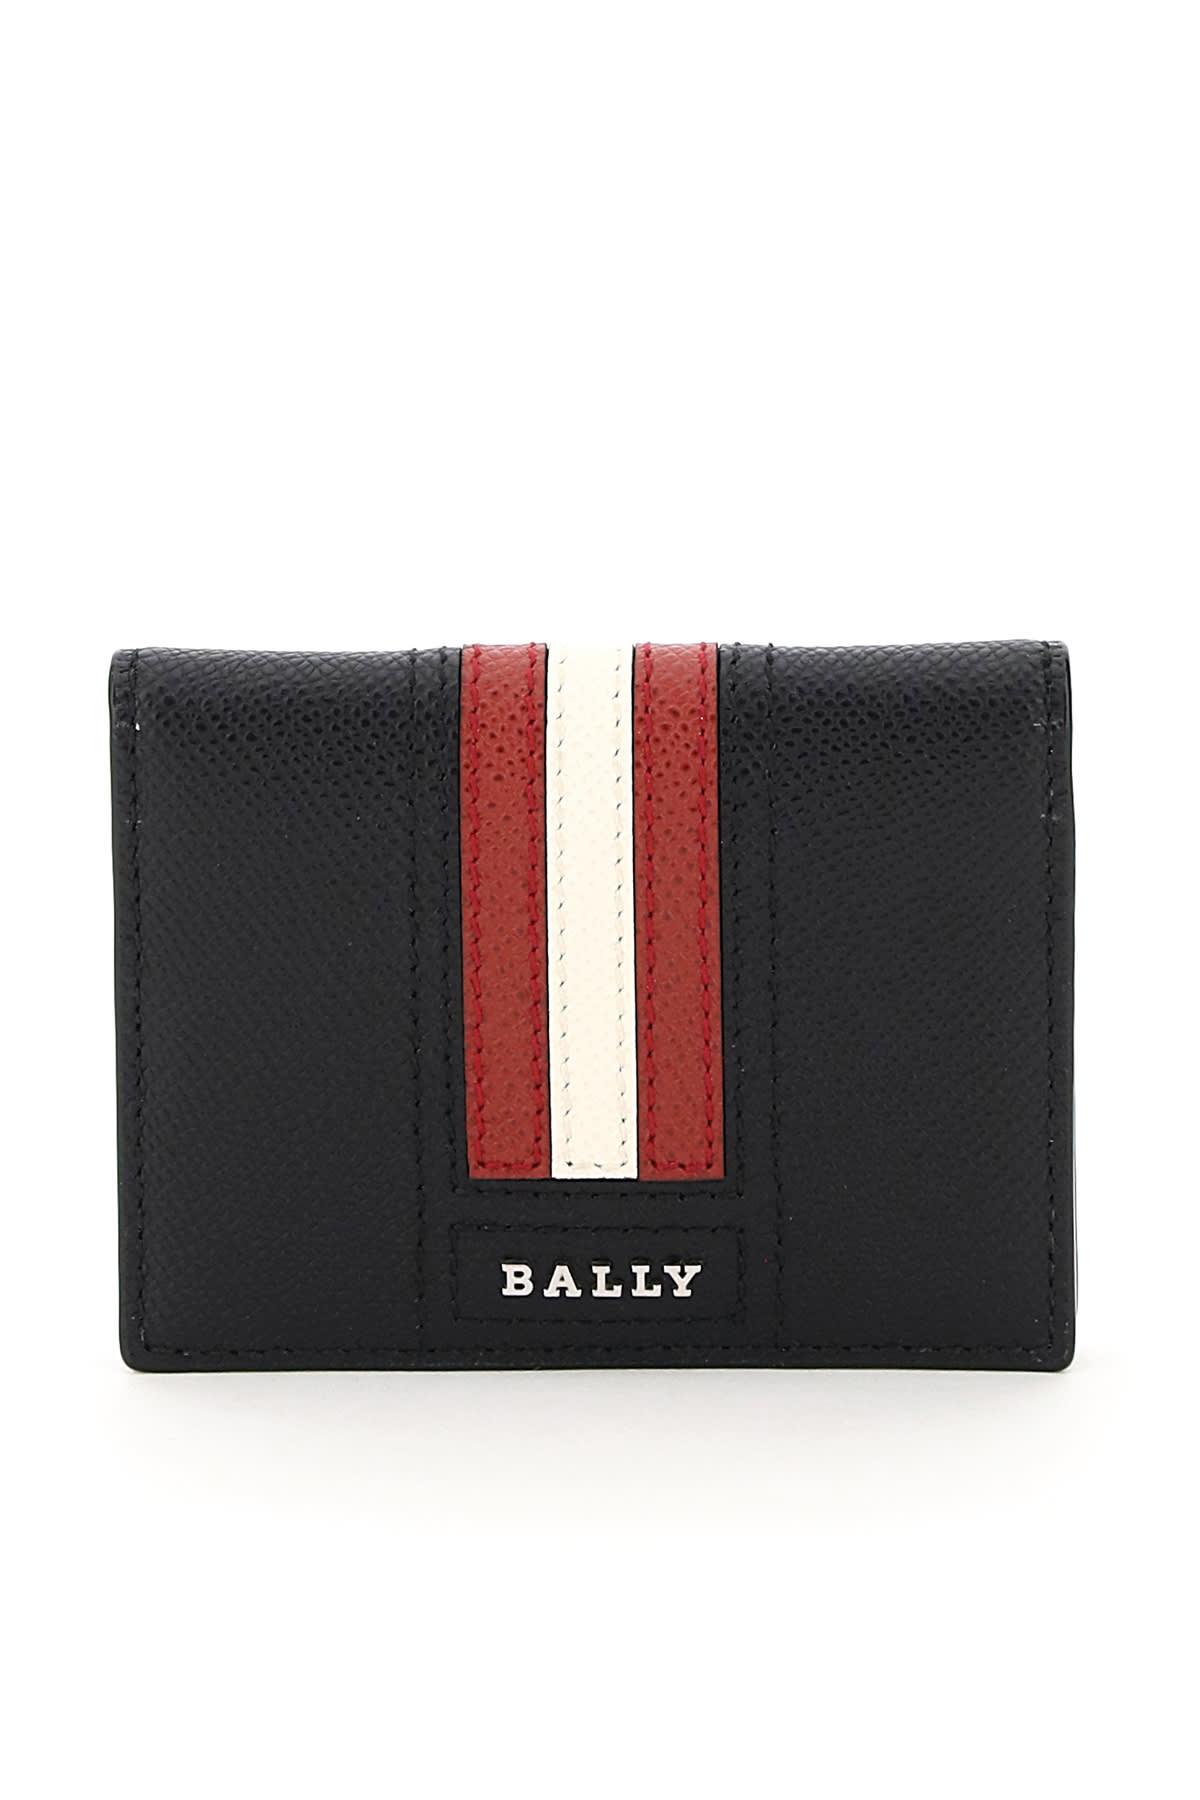 Bally TALDER BI-FOLD CARDHOLDER